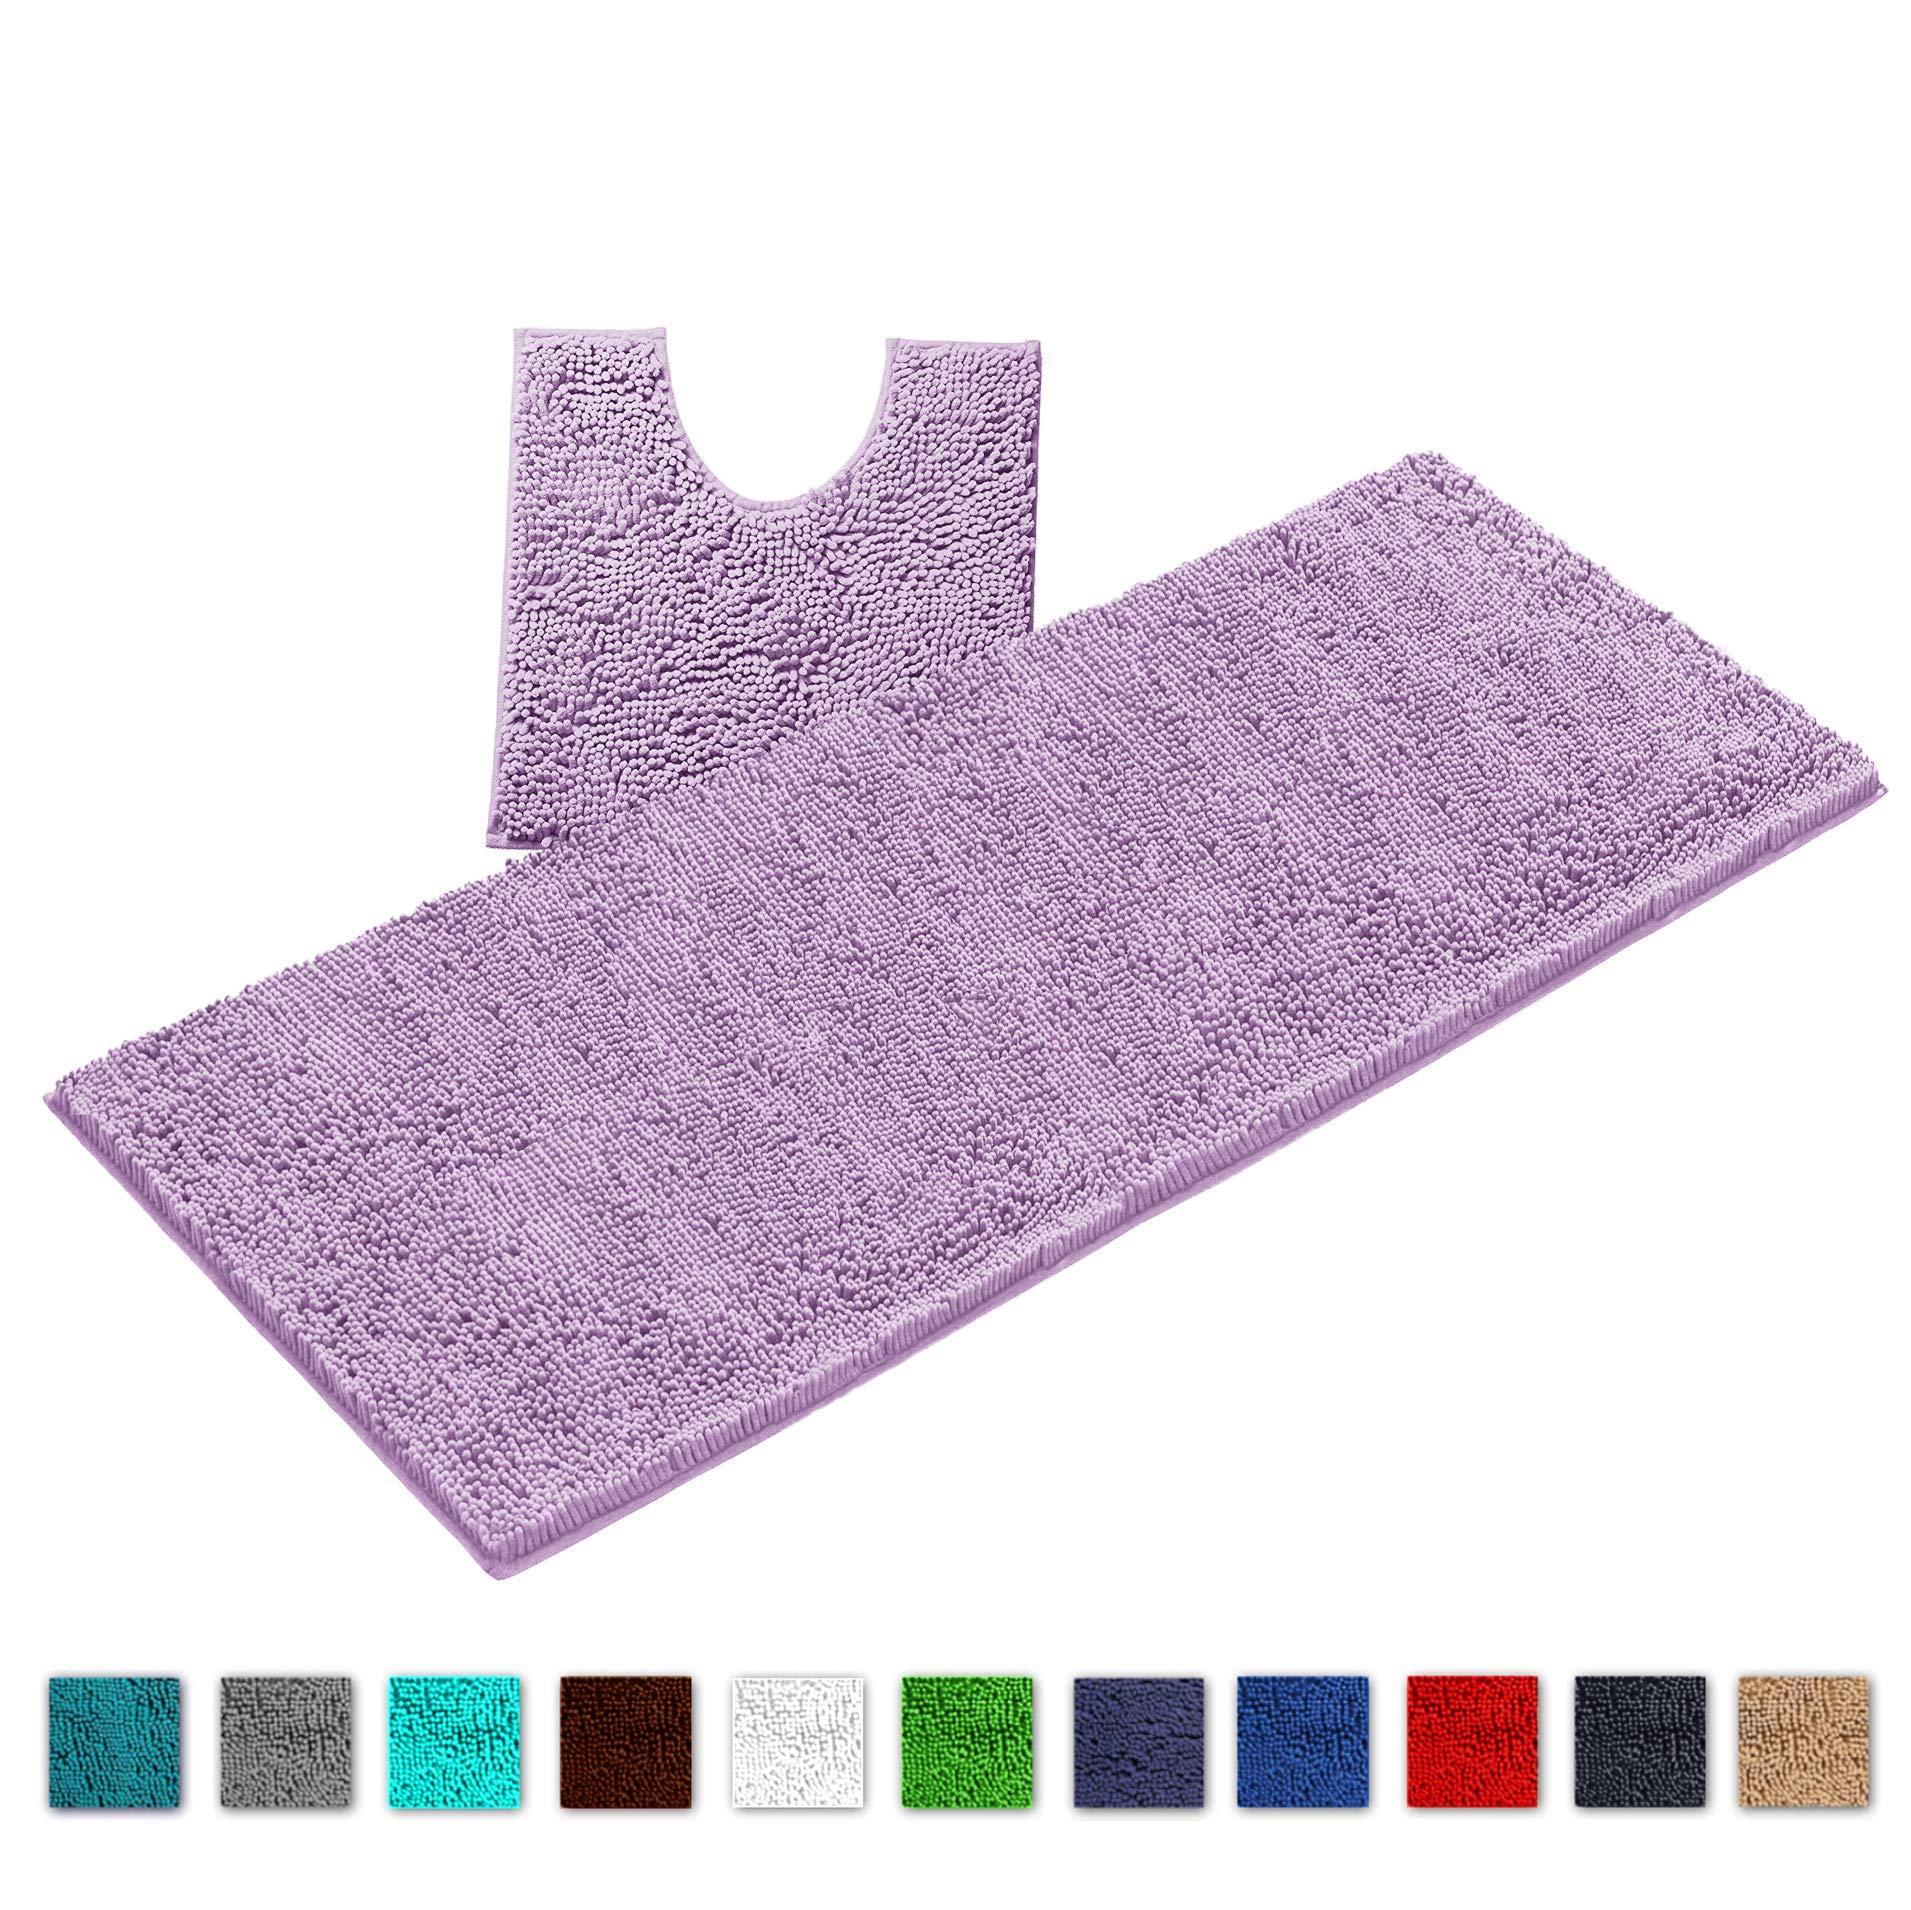 LuxUrux Bathroom Rugs Luxury Chenille 2-Piece Bath Mat Set, Soft Anti-Slip Bath Rug +Toilet Mat.1'' Microfiber Shaggy Carpet, Super Absorbent Machine Washable Bath Mats (Curved Set X-Large, Lavender)